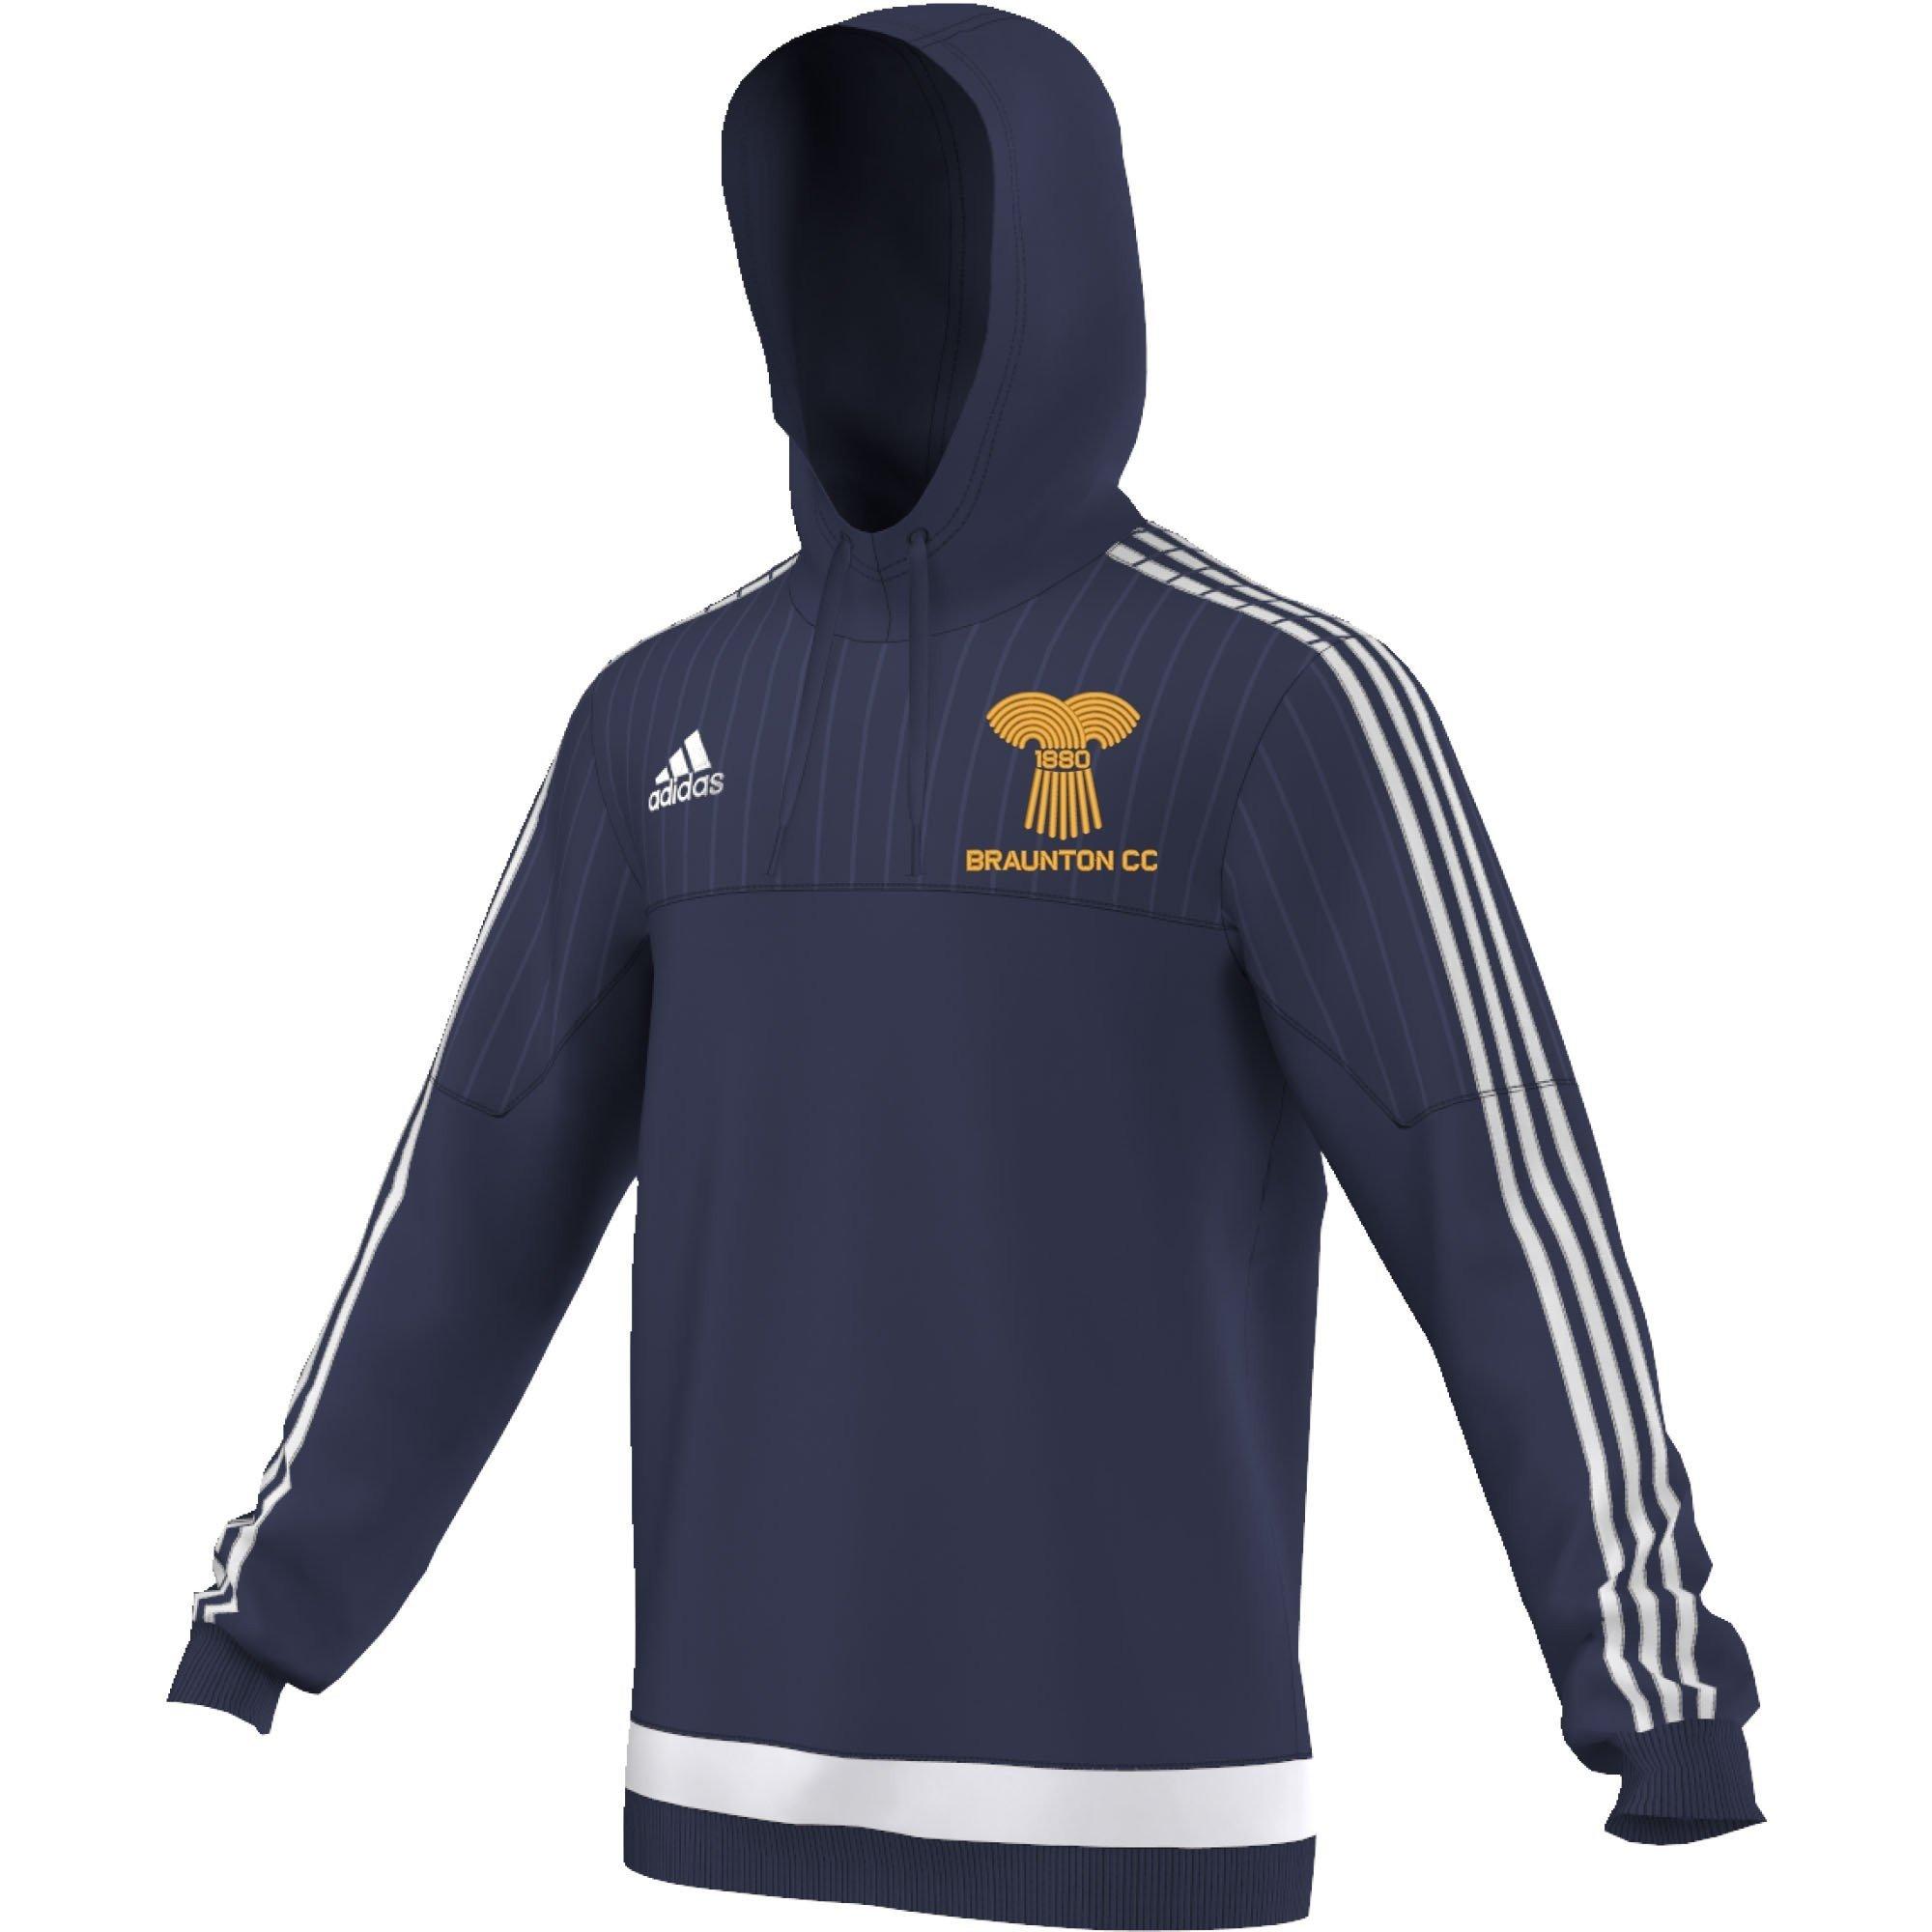 Braunton CC Adidas Navy Hoody